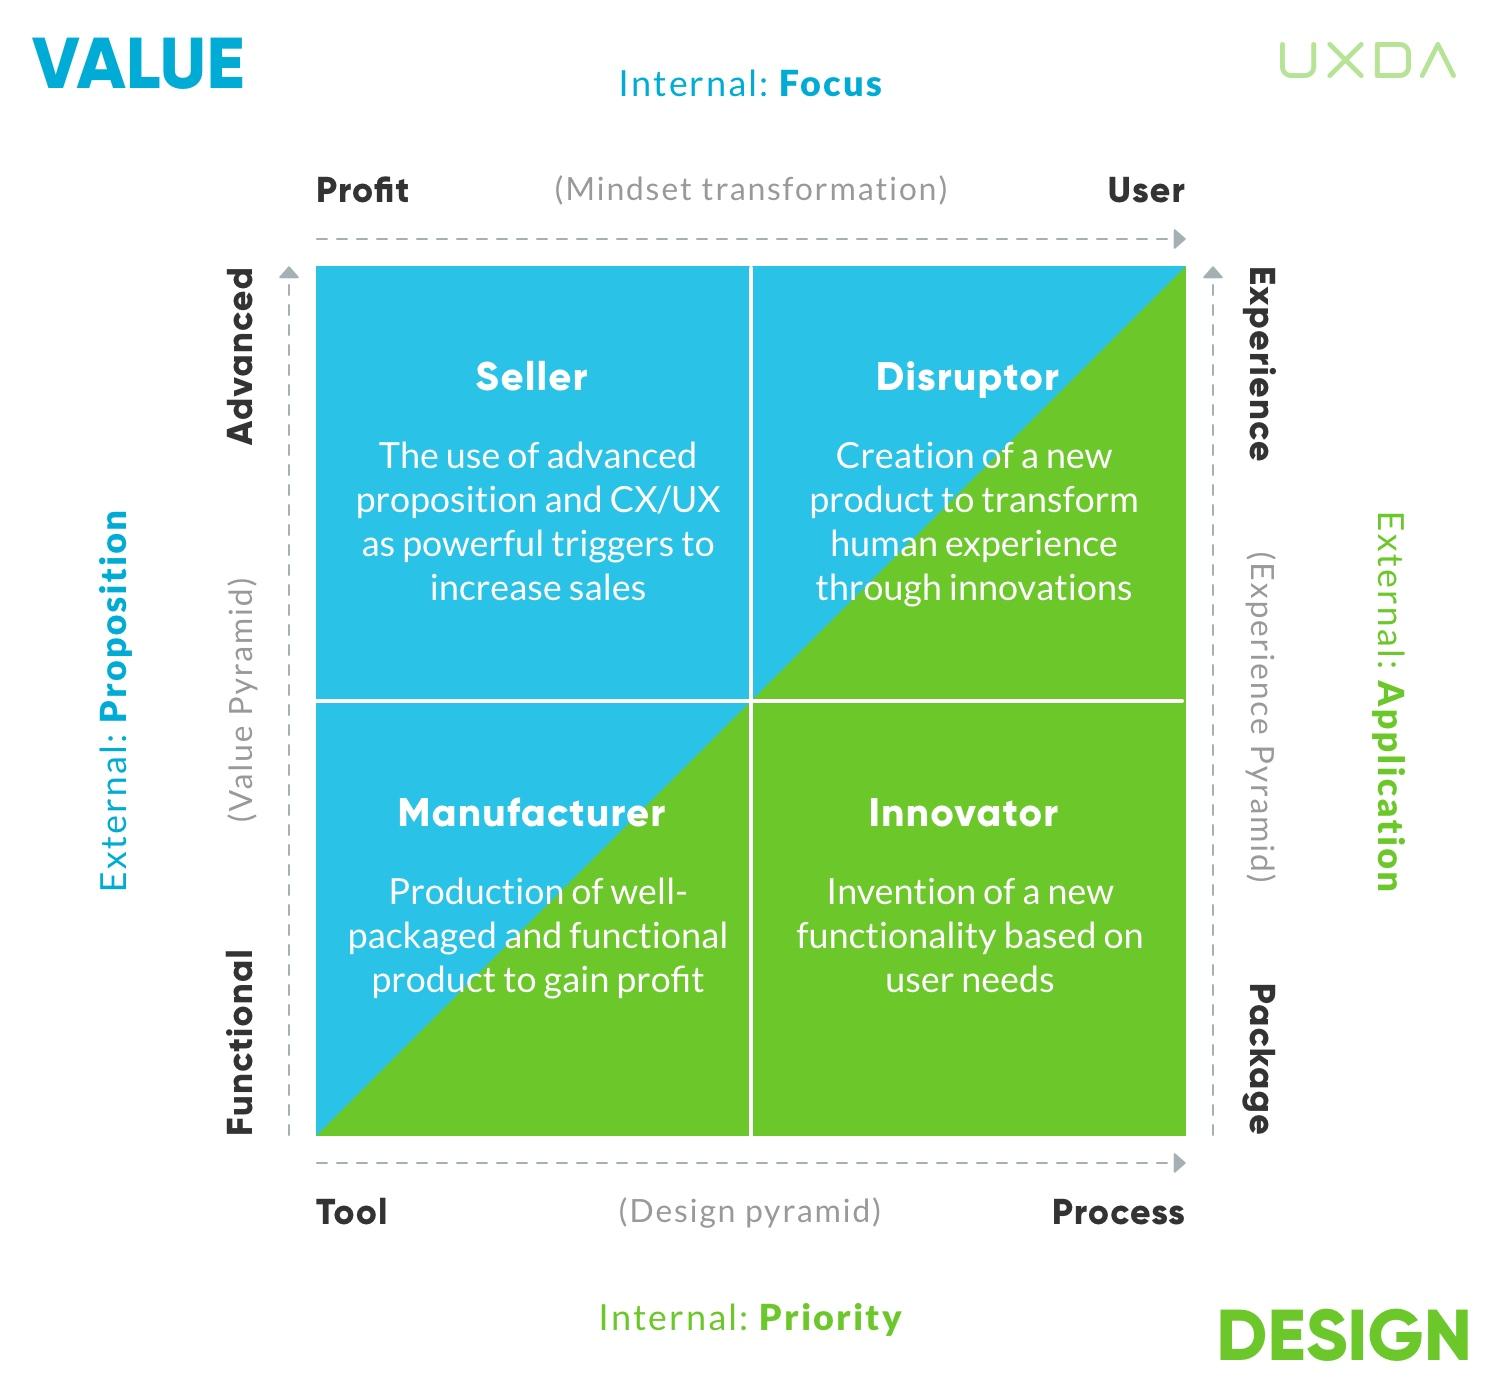 financial-design-matrix-for-banking-disruption-12.jpg